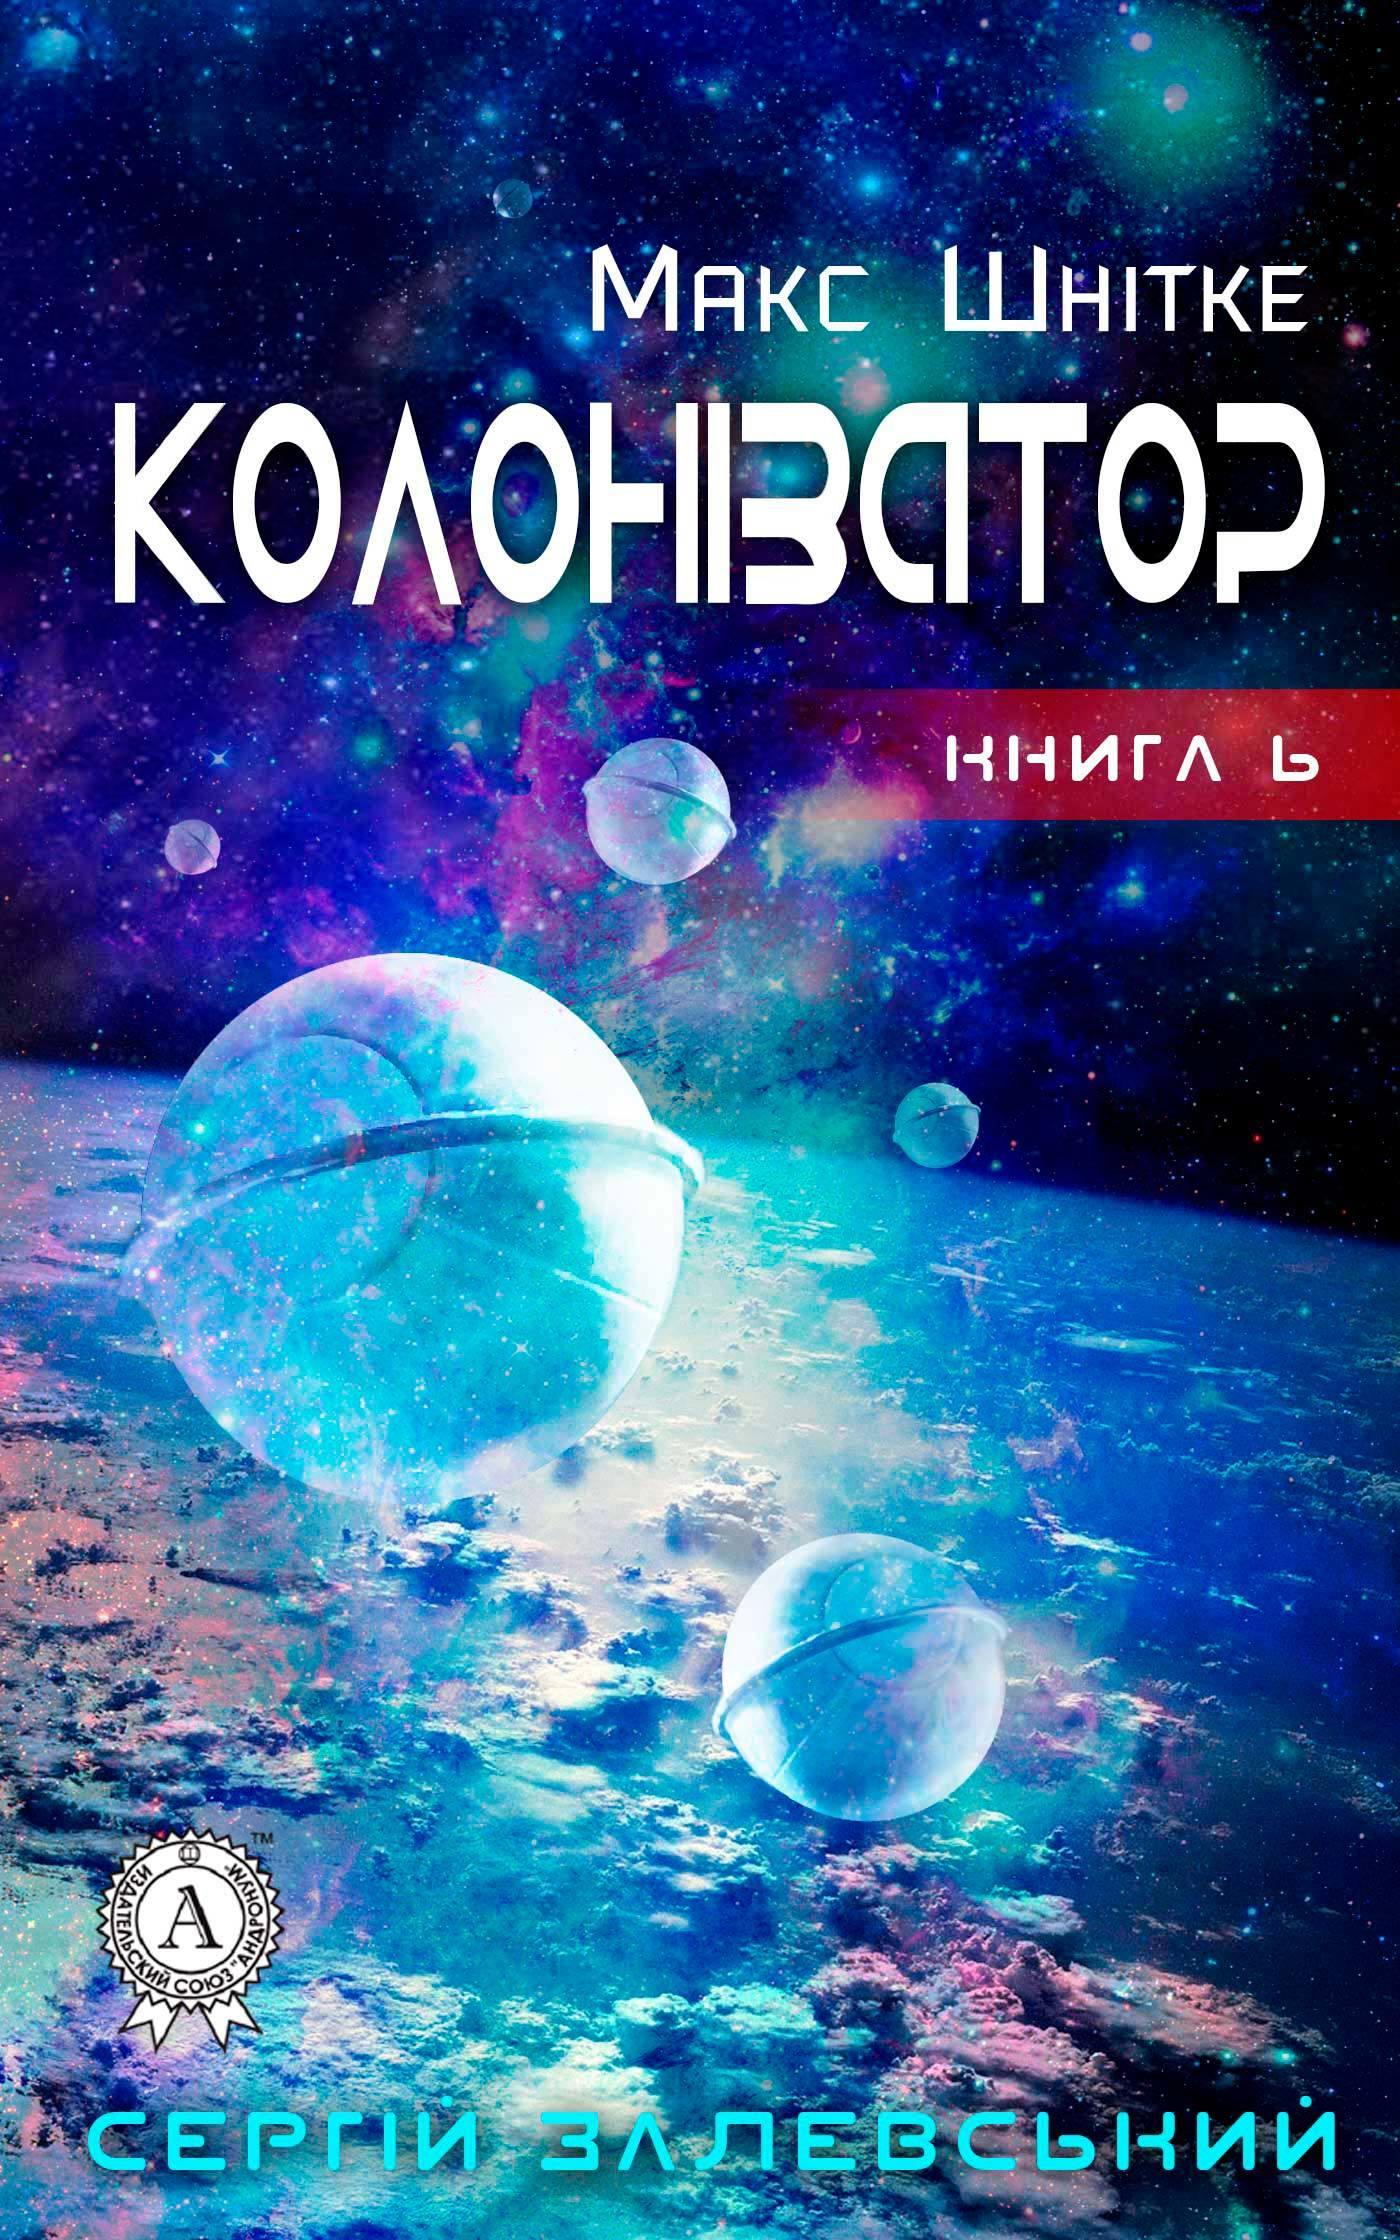 Шикарная заставка для романа 33/51/78/33517839.bin.dir/33517839.cover.jpg обложка